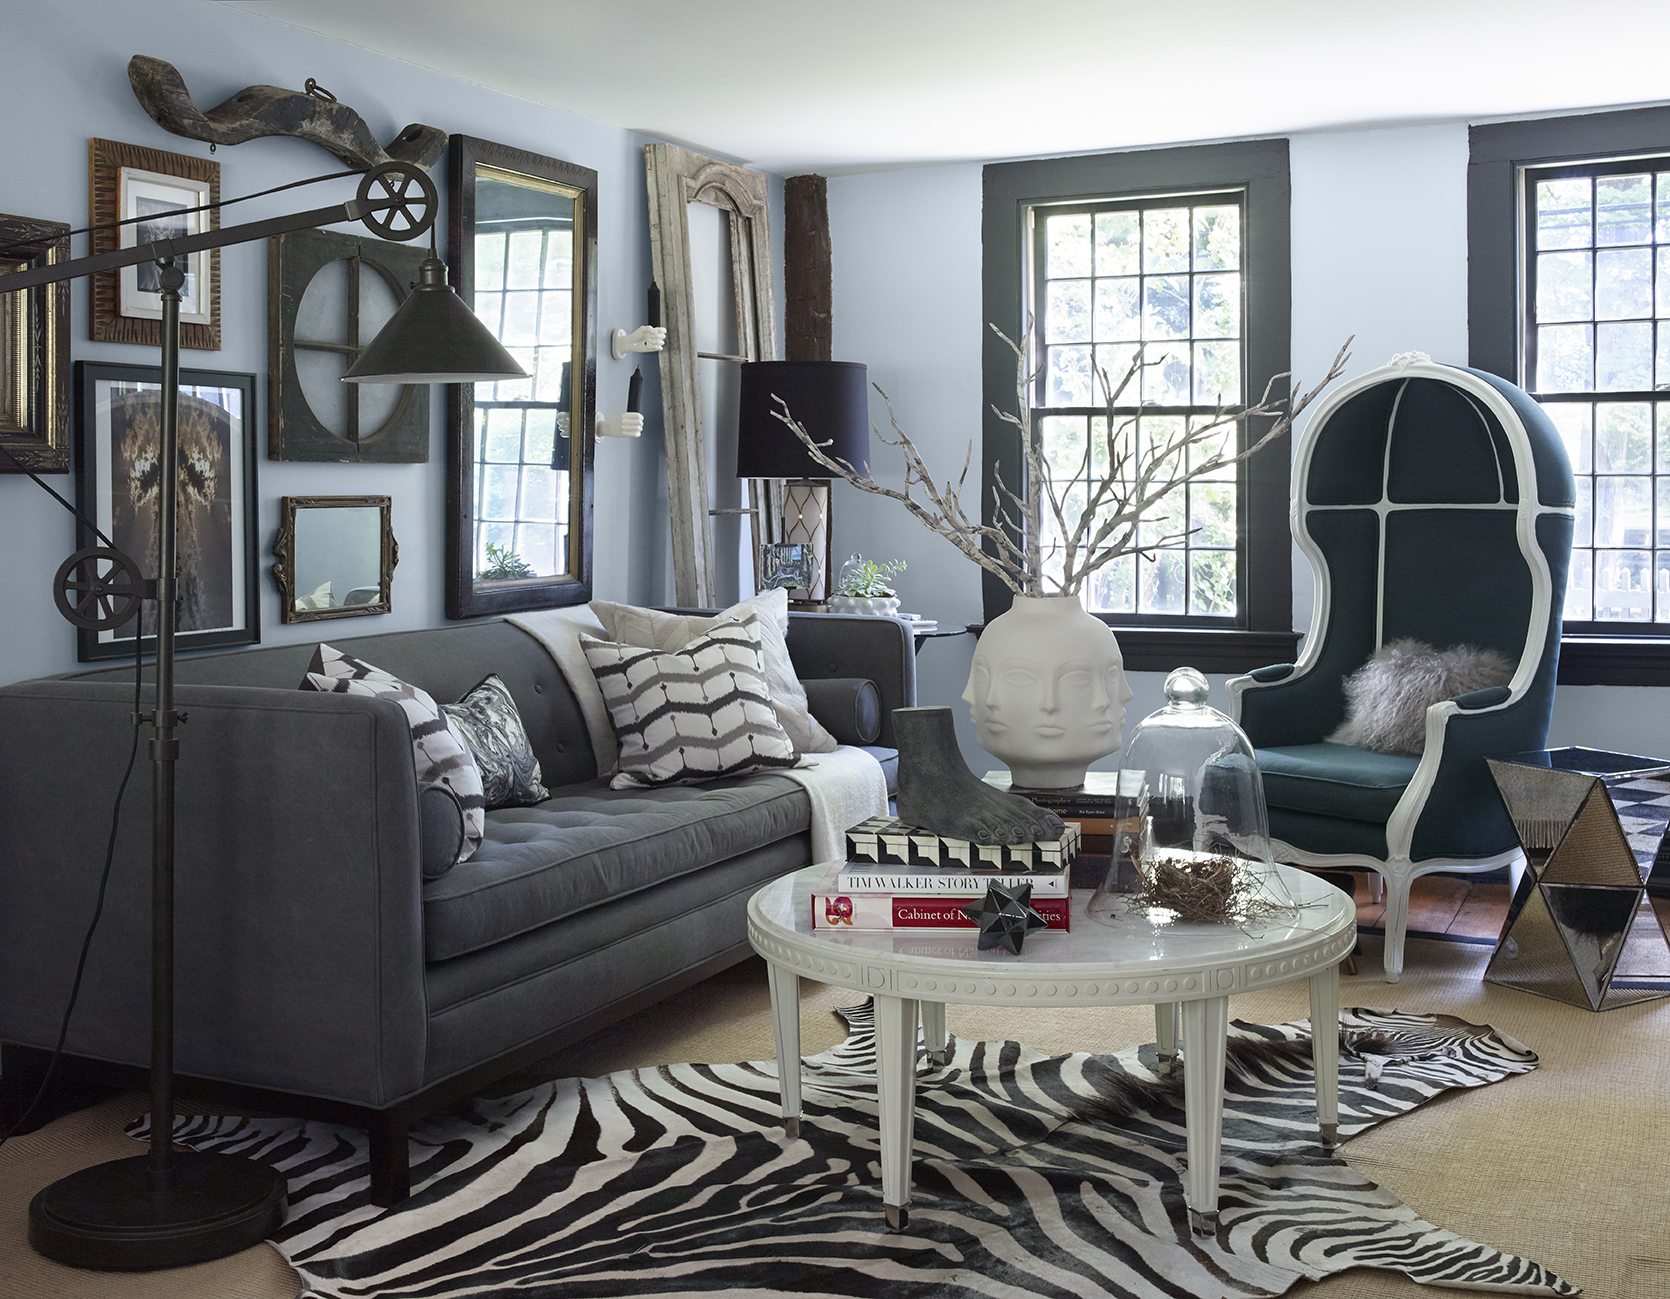 Before pic of the living room                  Photo by  Ellen McDermott